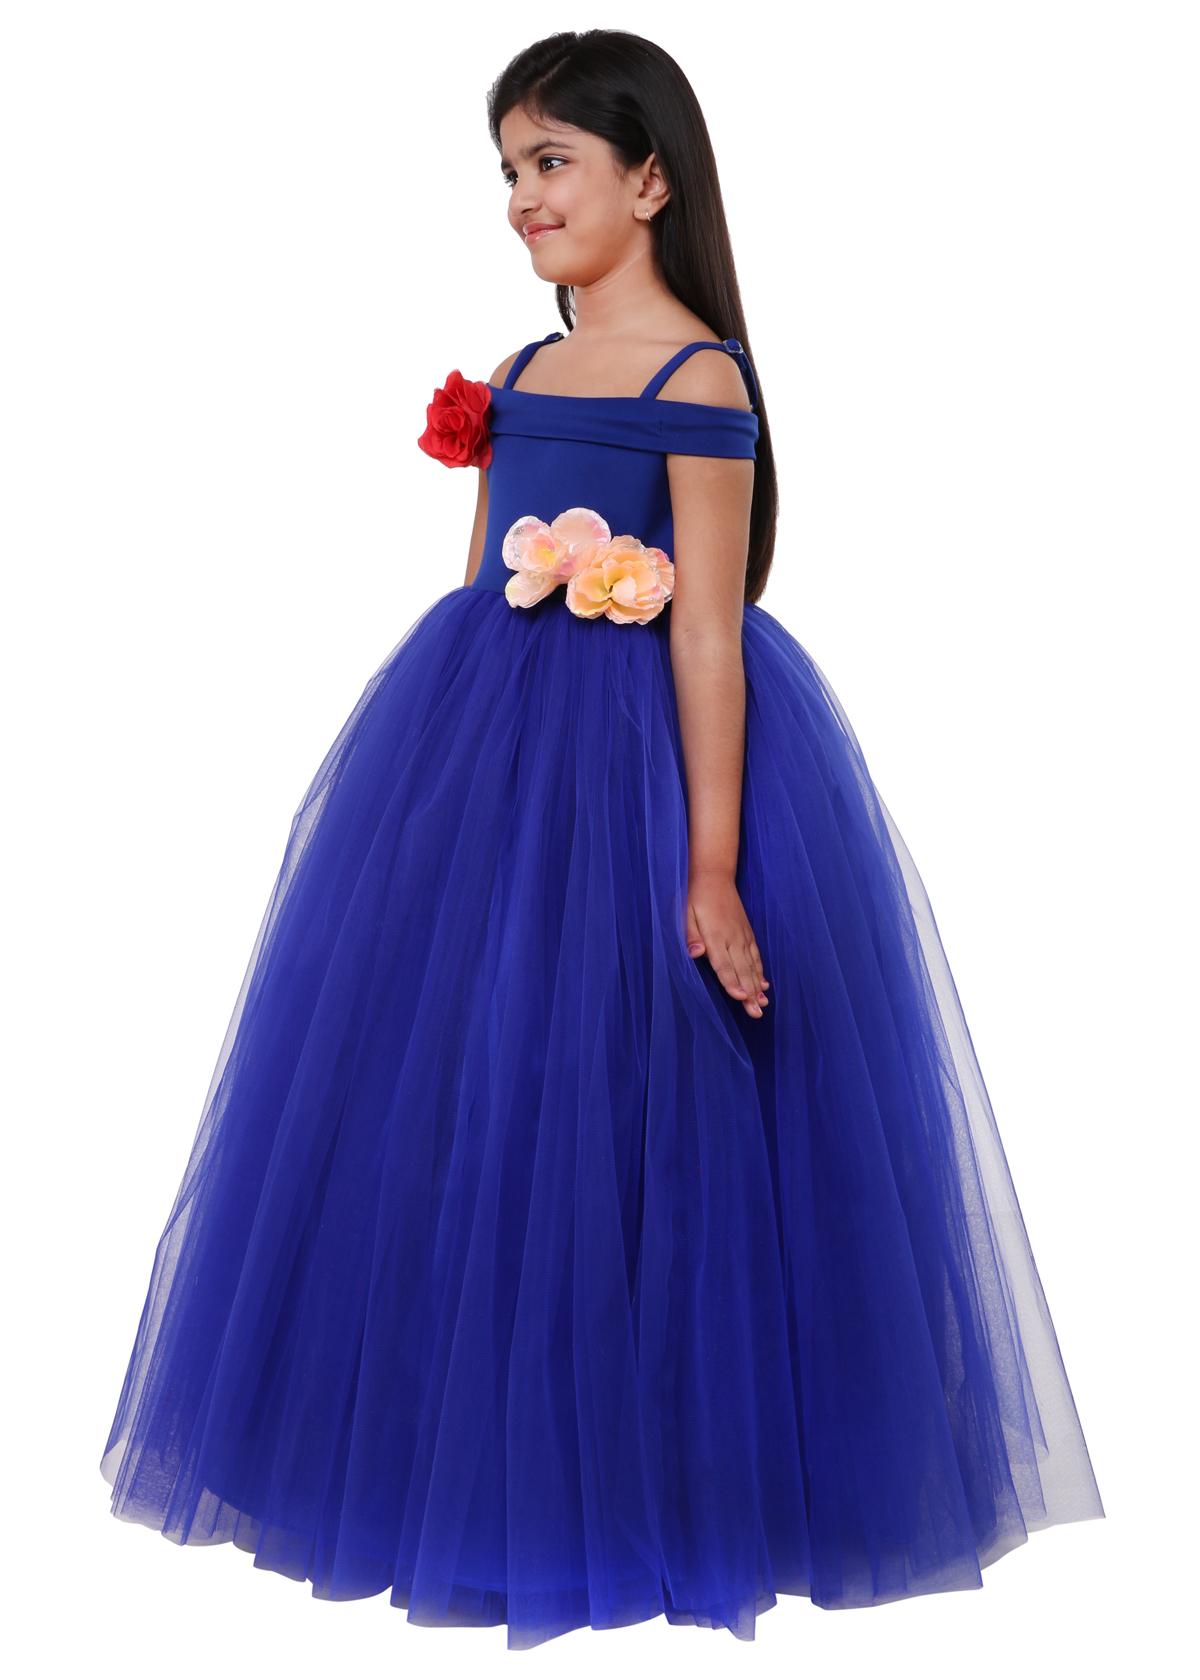 sofyana royal blue princess little girl bridesmaid dress